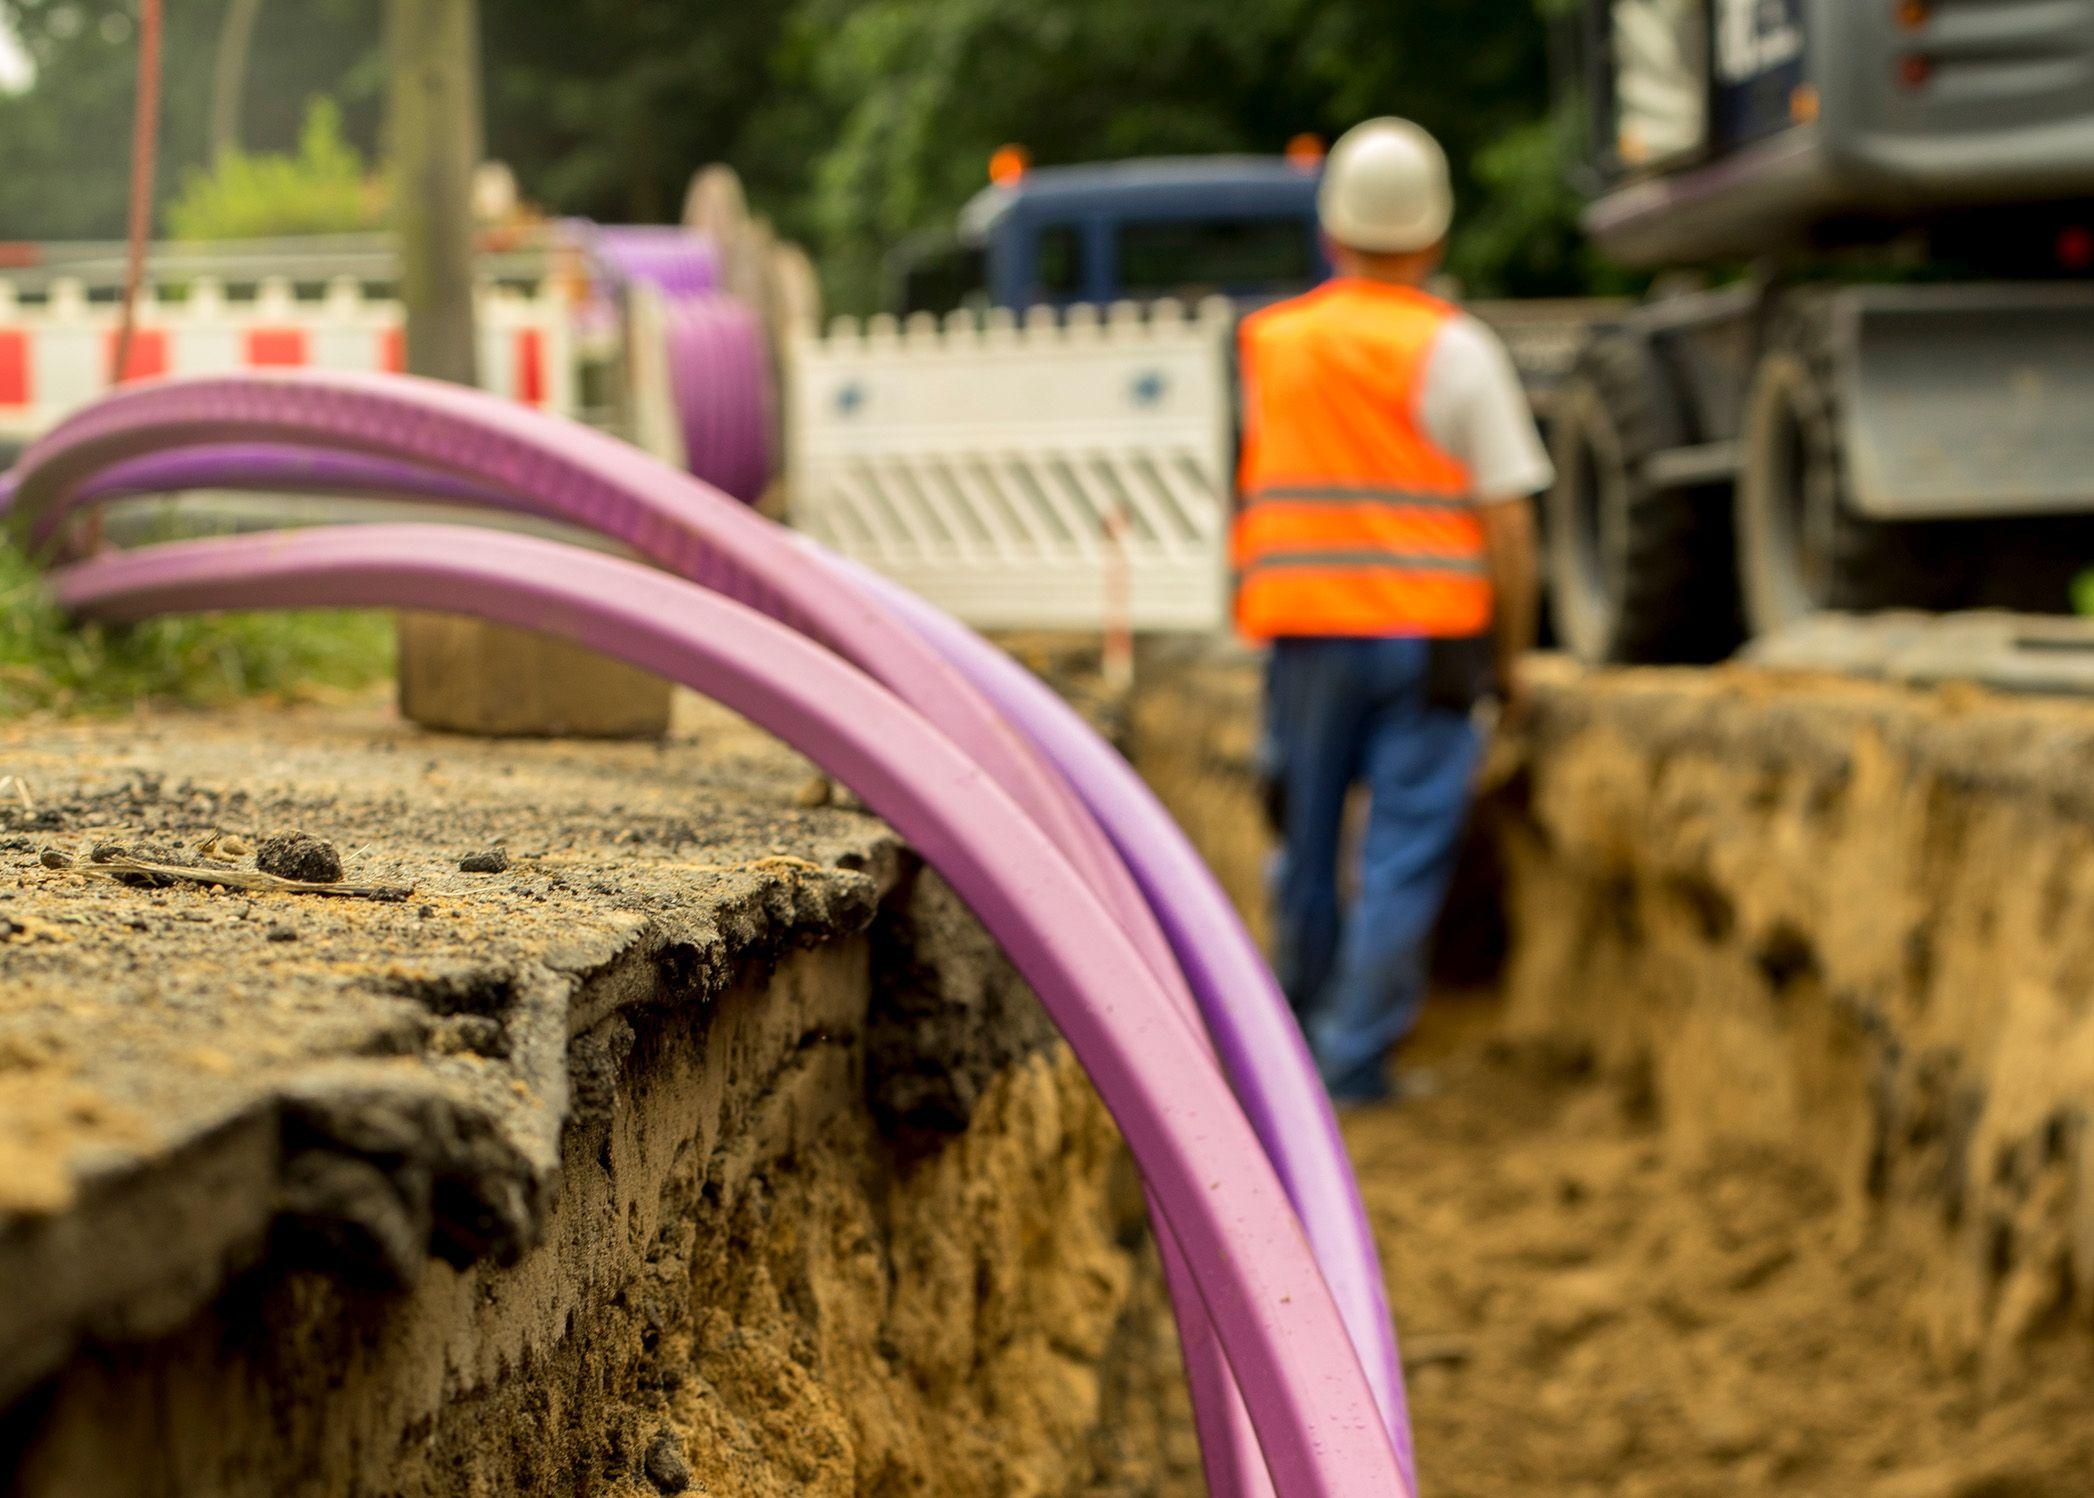 Bauarbeiten ab 22.07.2019: Das Baufeld wird erschlossen